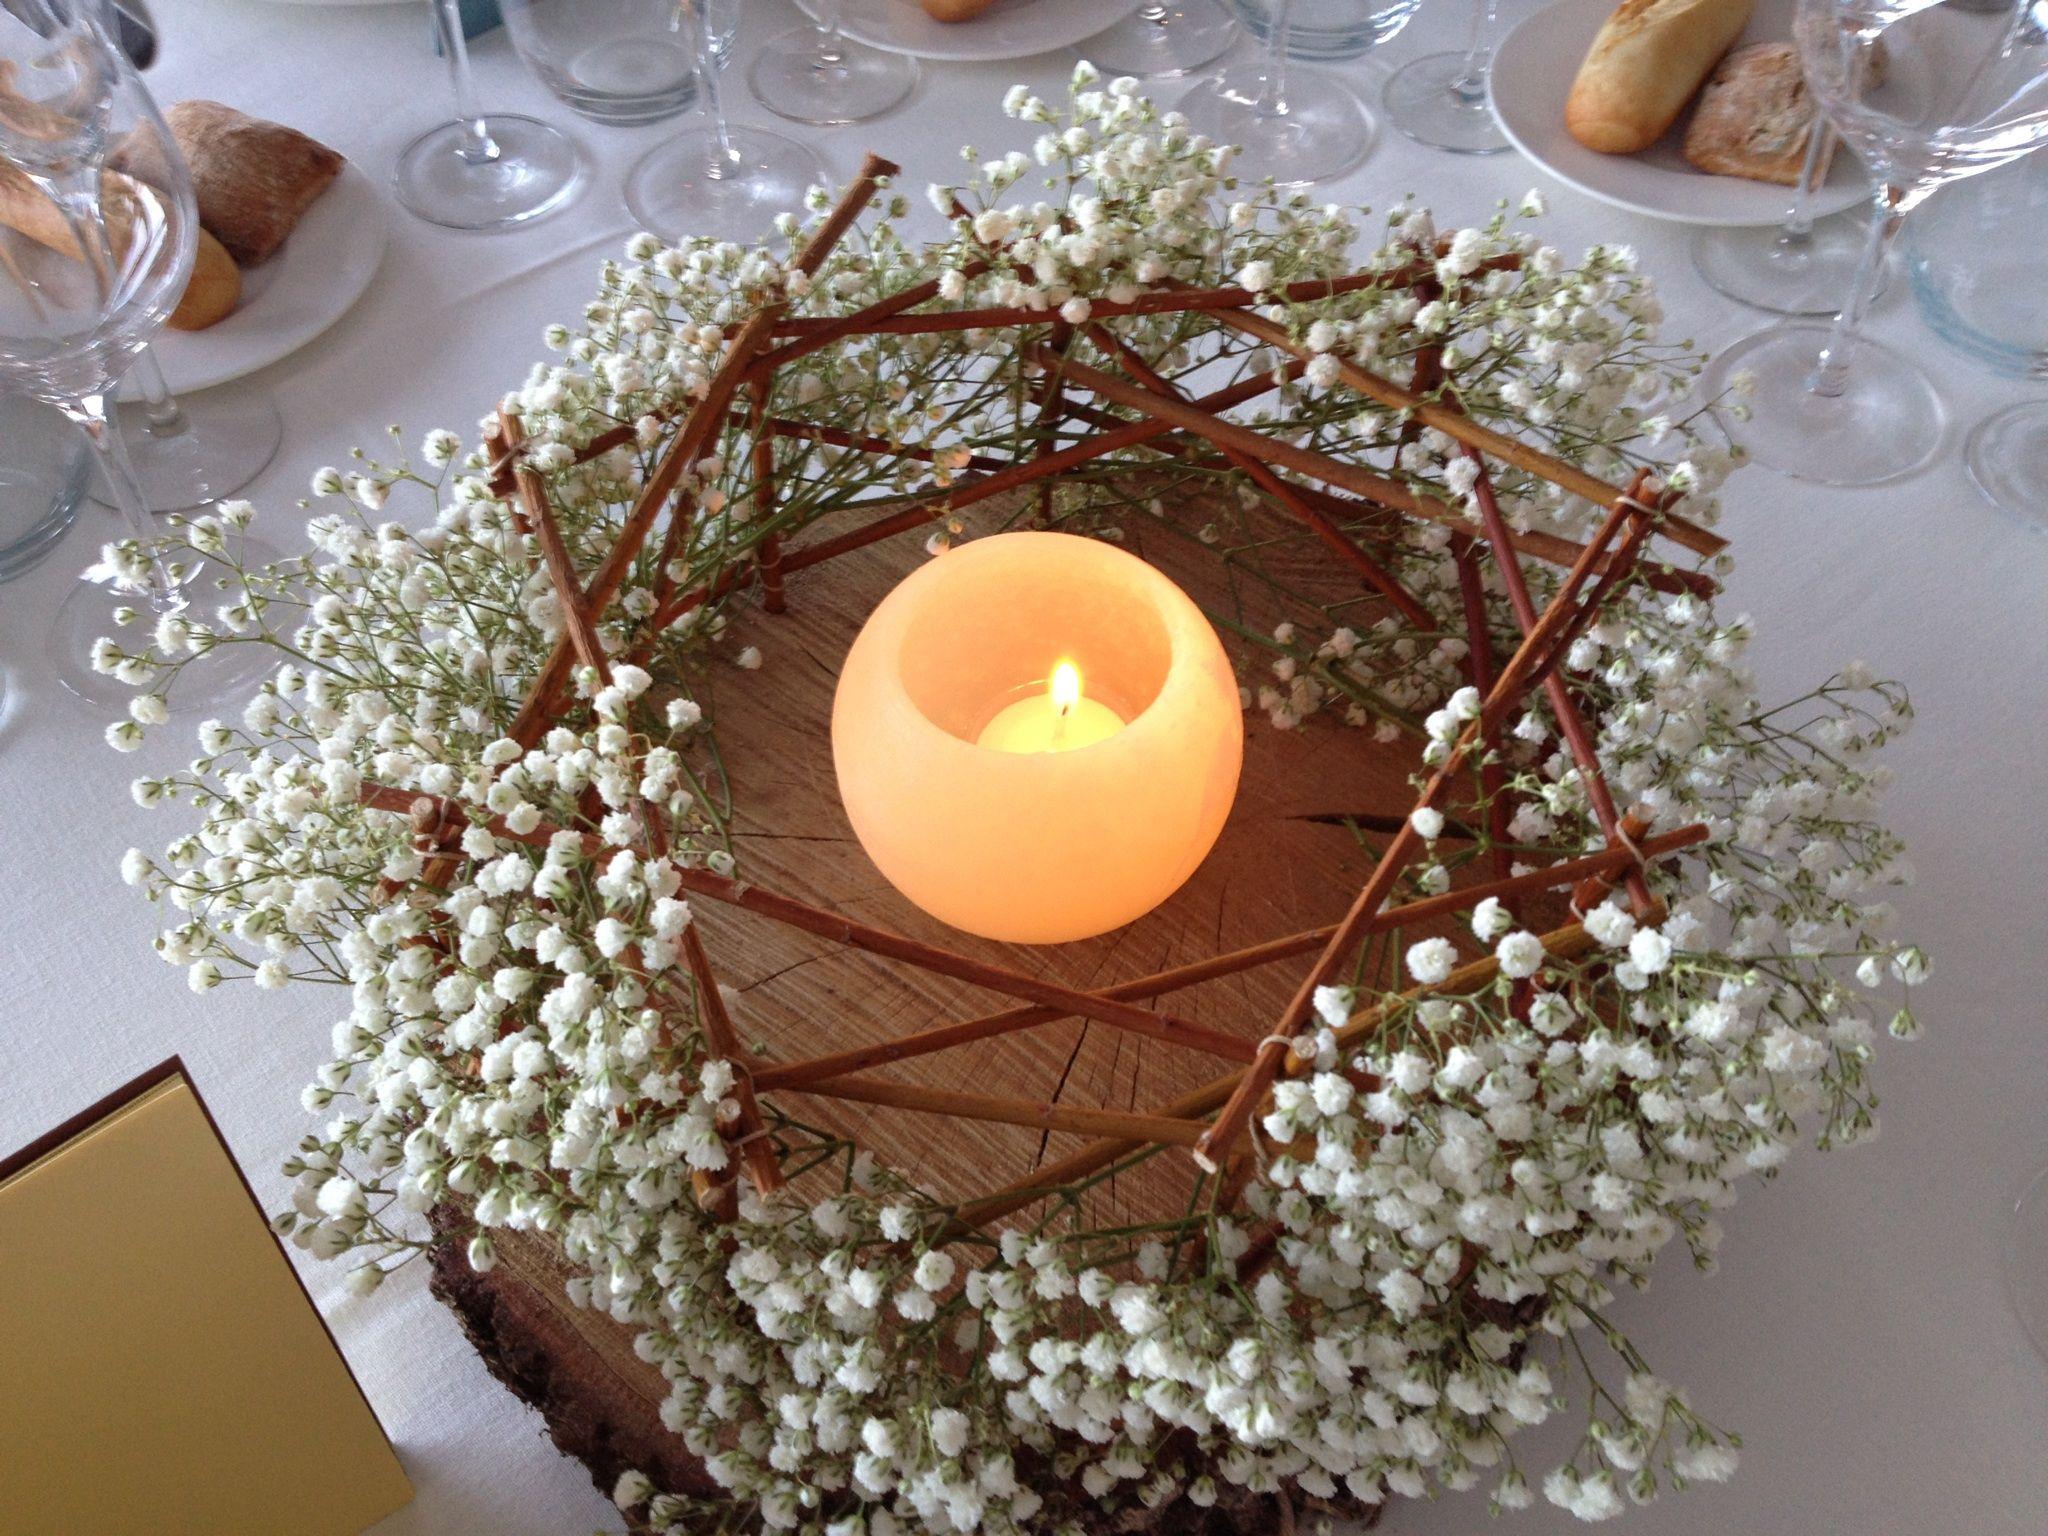 Estructura de troncos con paniculata y velas flores for Centro de mesa boda campestre